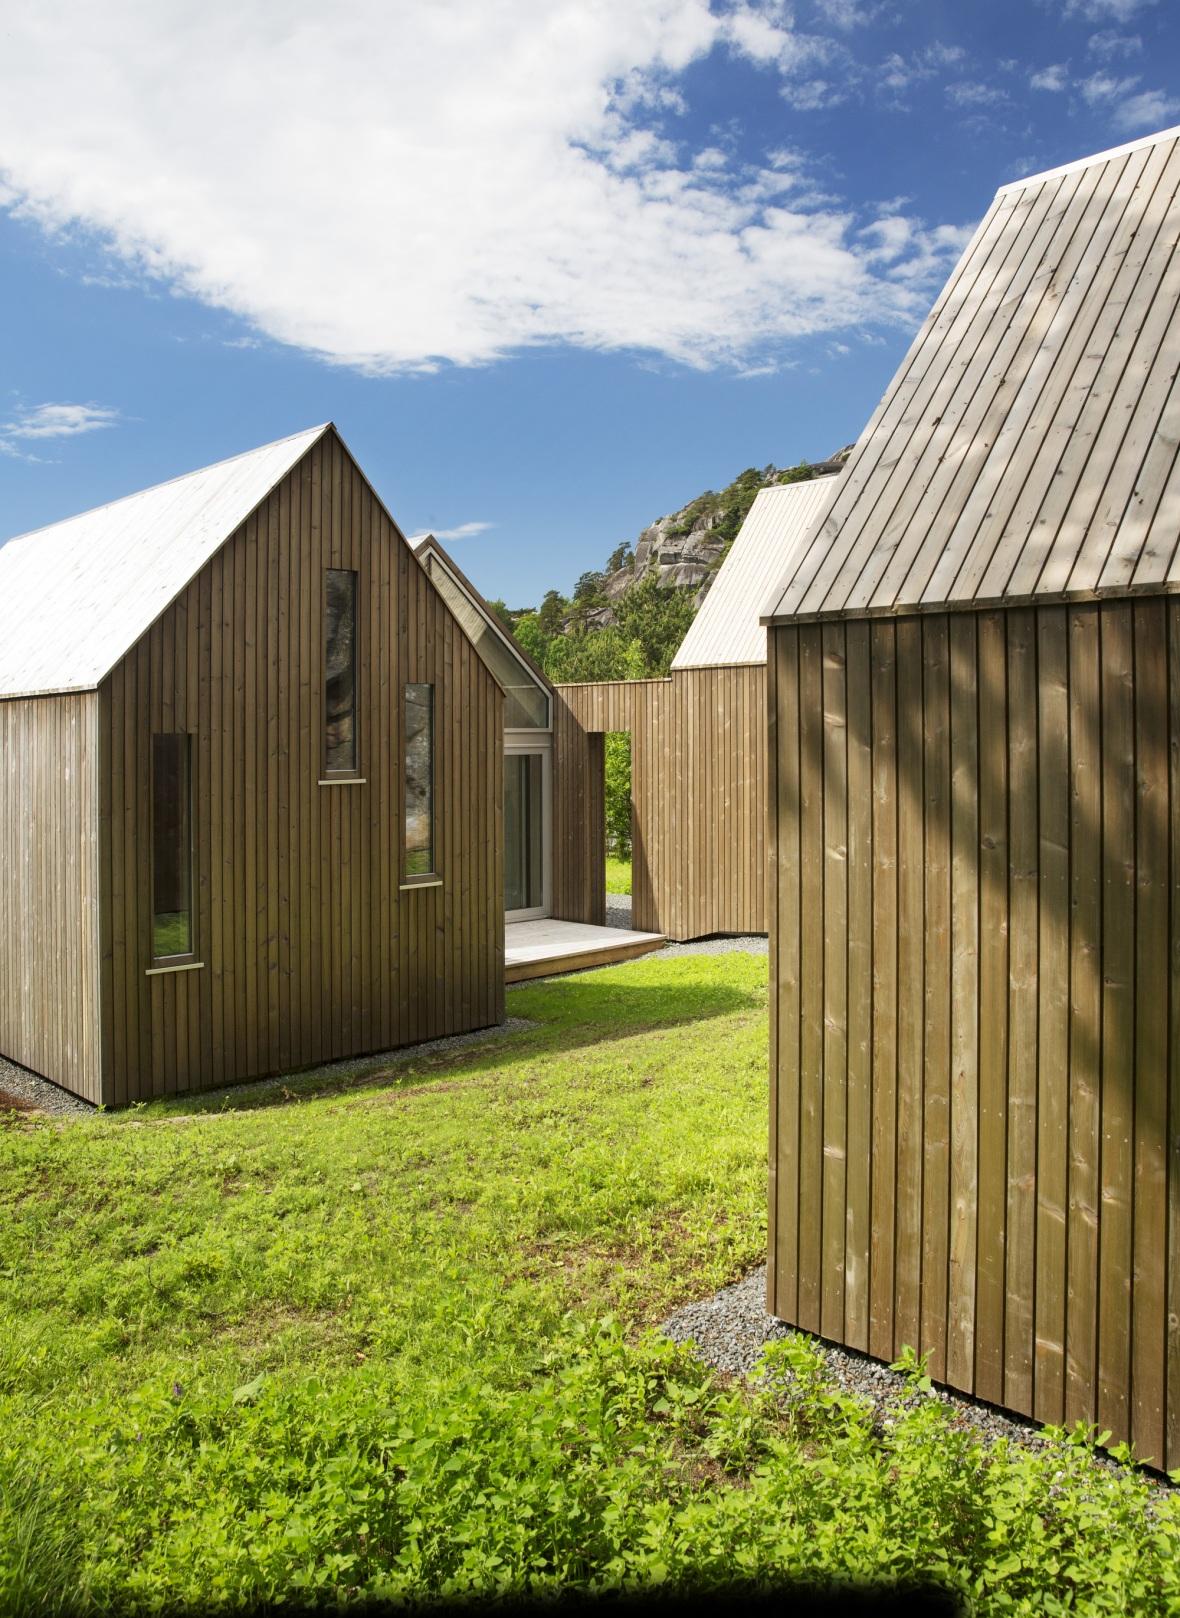 reiulf-ramstad-micro-cluster-cabins-1